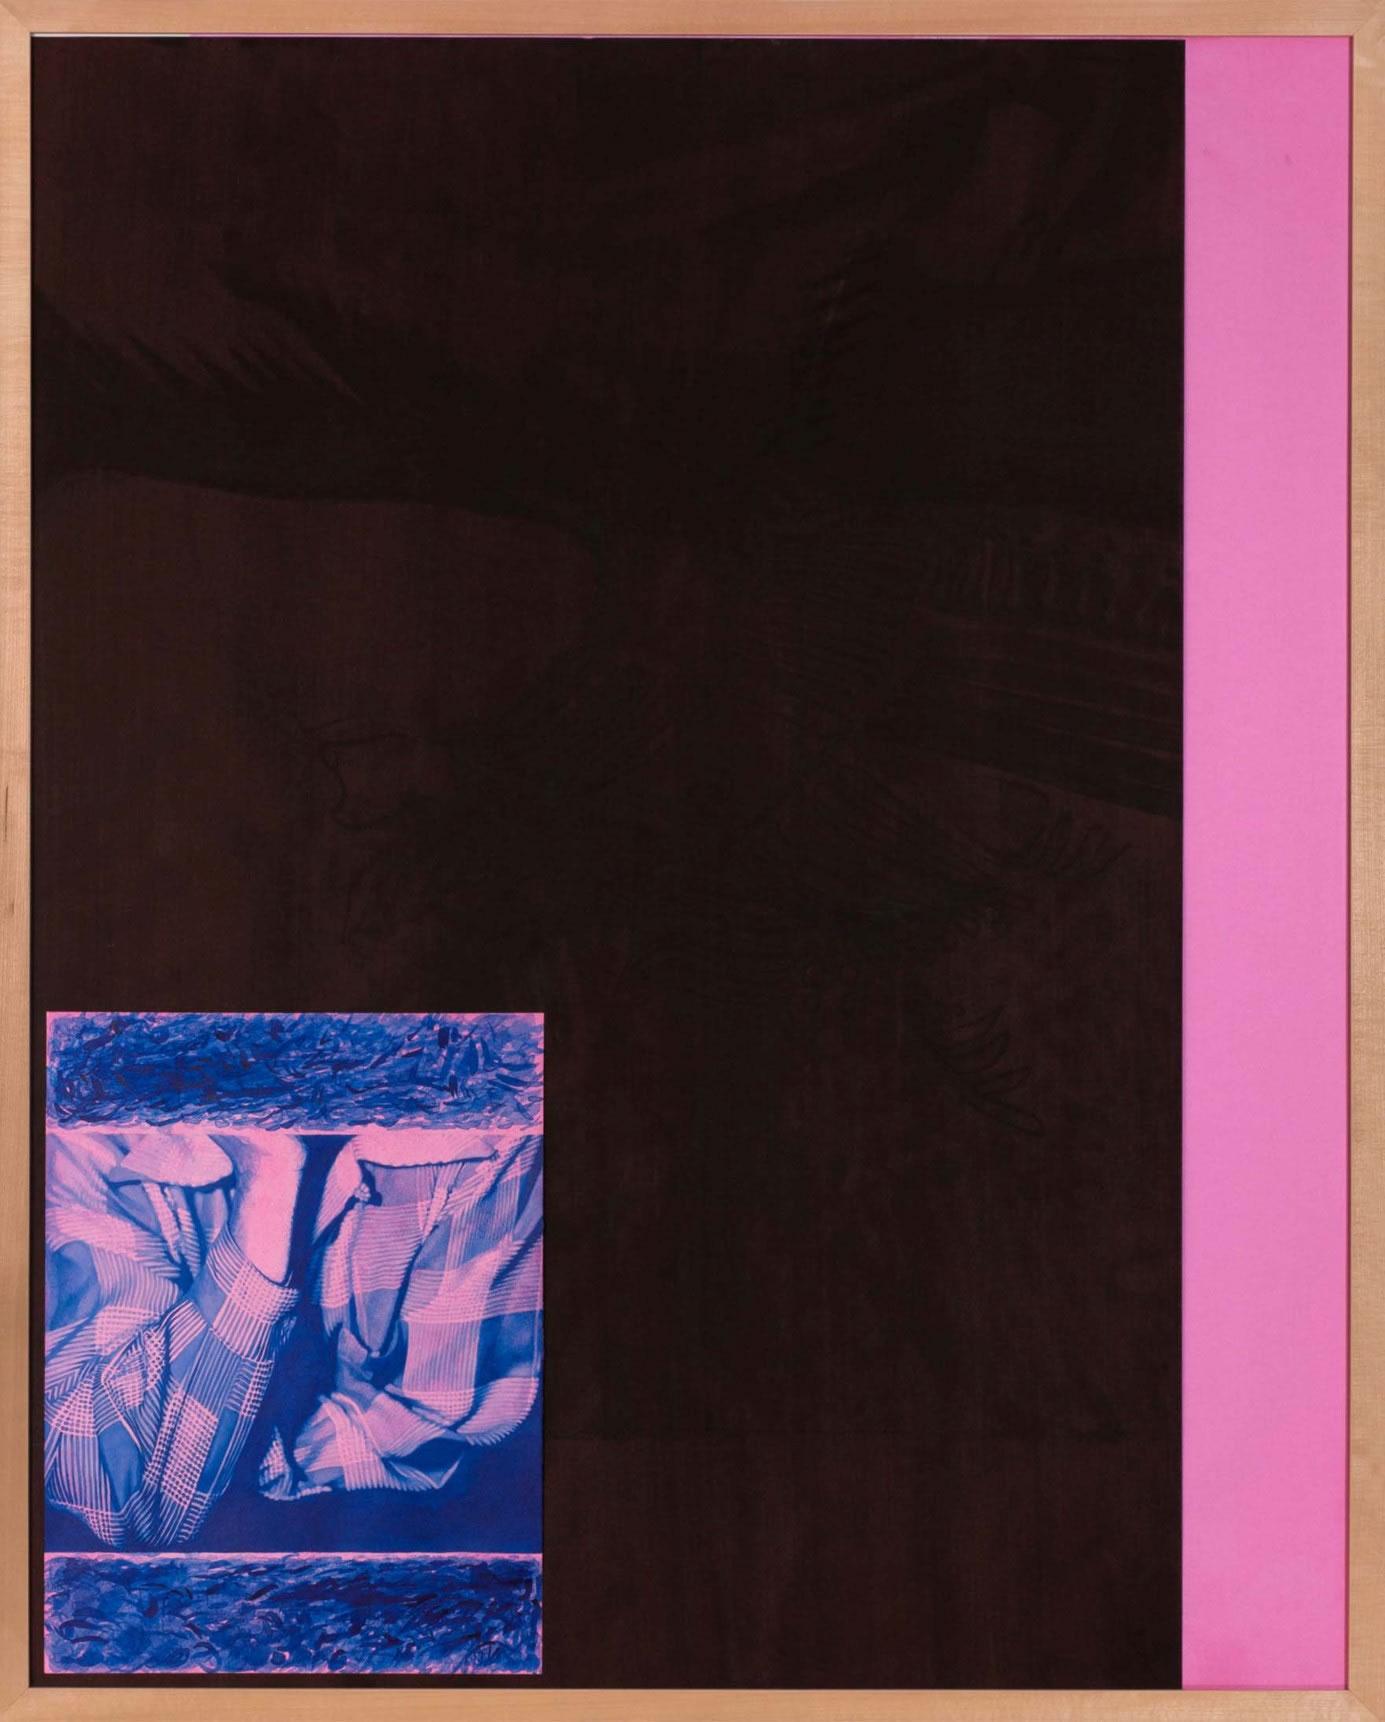 Philip Patkovic | 2017 | Tusche auf Papier | Ink on paper | 100 x 80 cm | Courtesy Bechter Kastovsky | Foto Johannes Puch